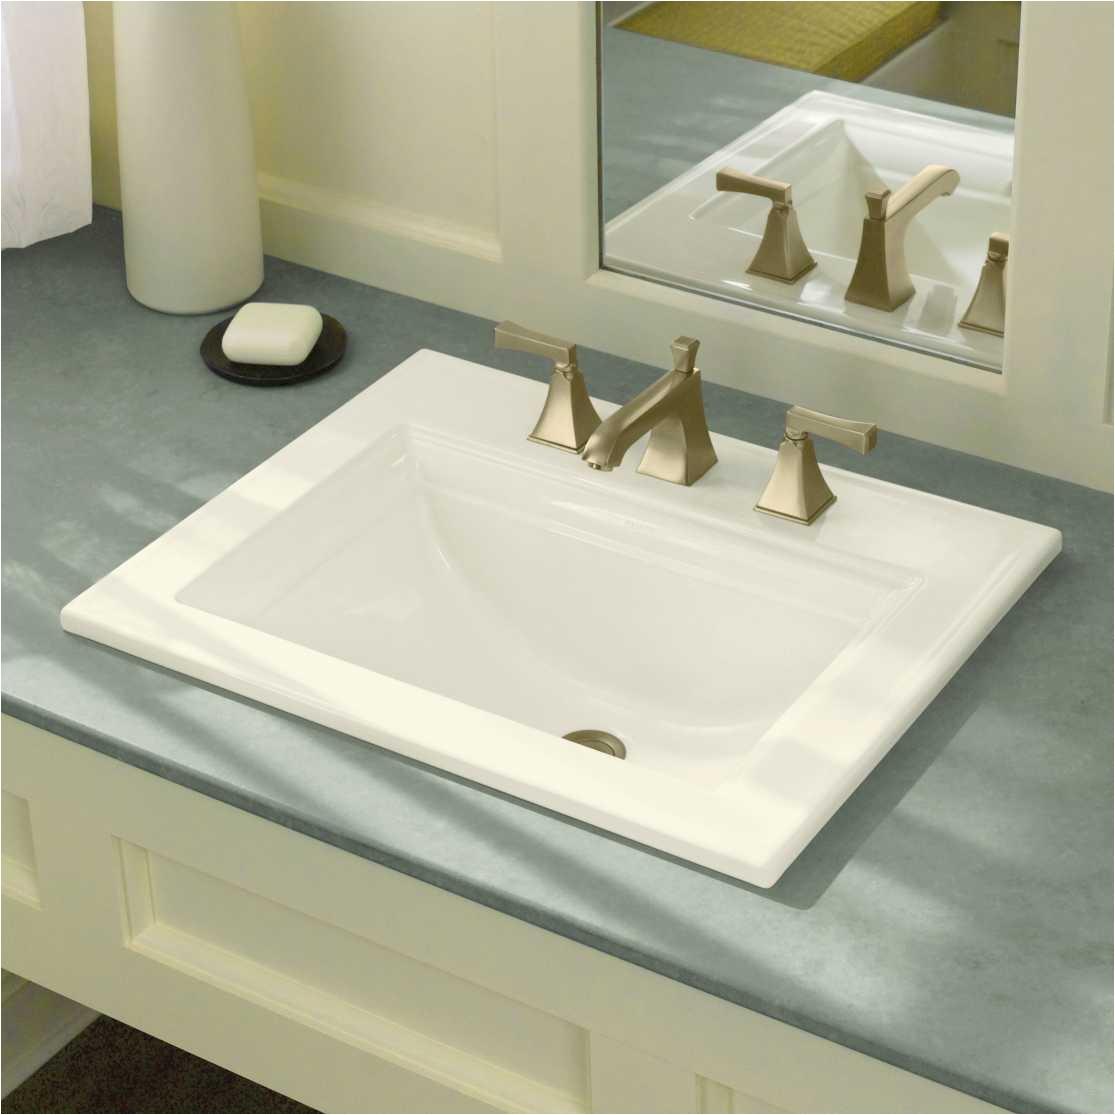 Kohler Bathroom Design Ideas Short Information Kohler Bathtub Installation Guide